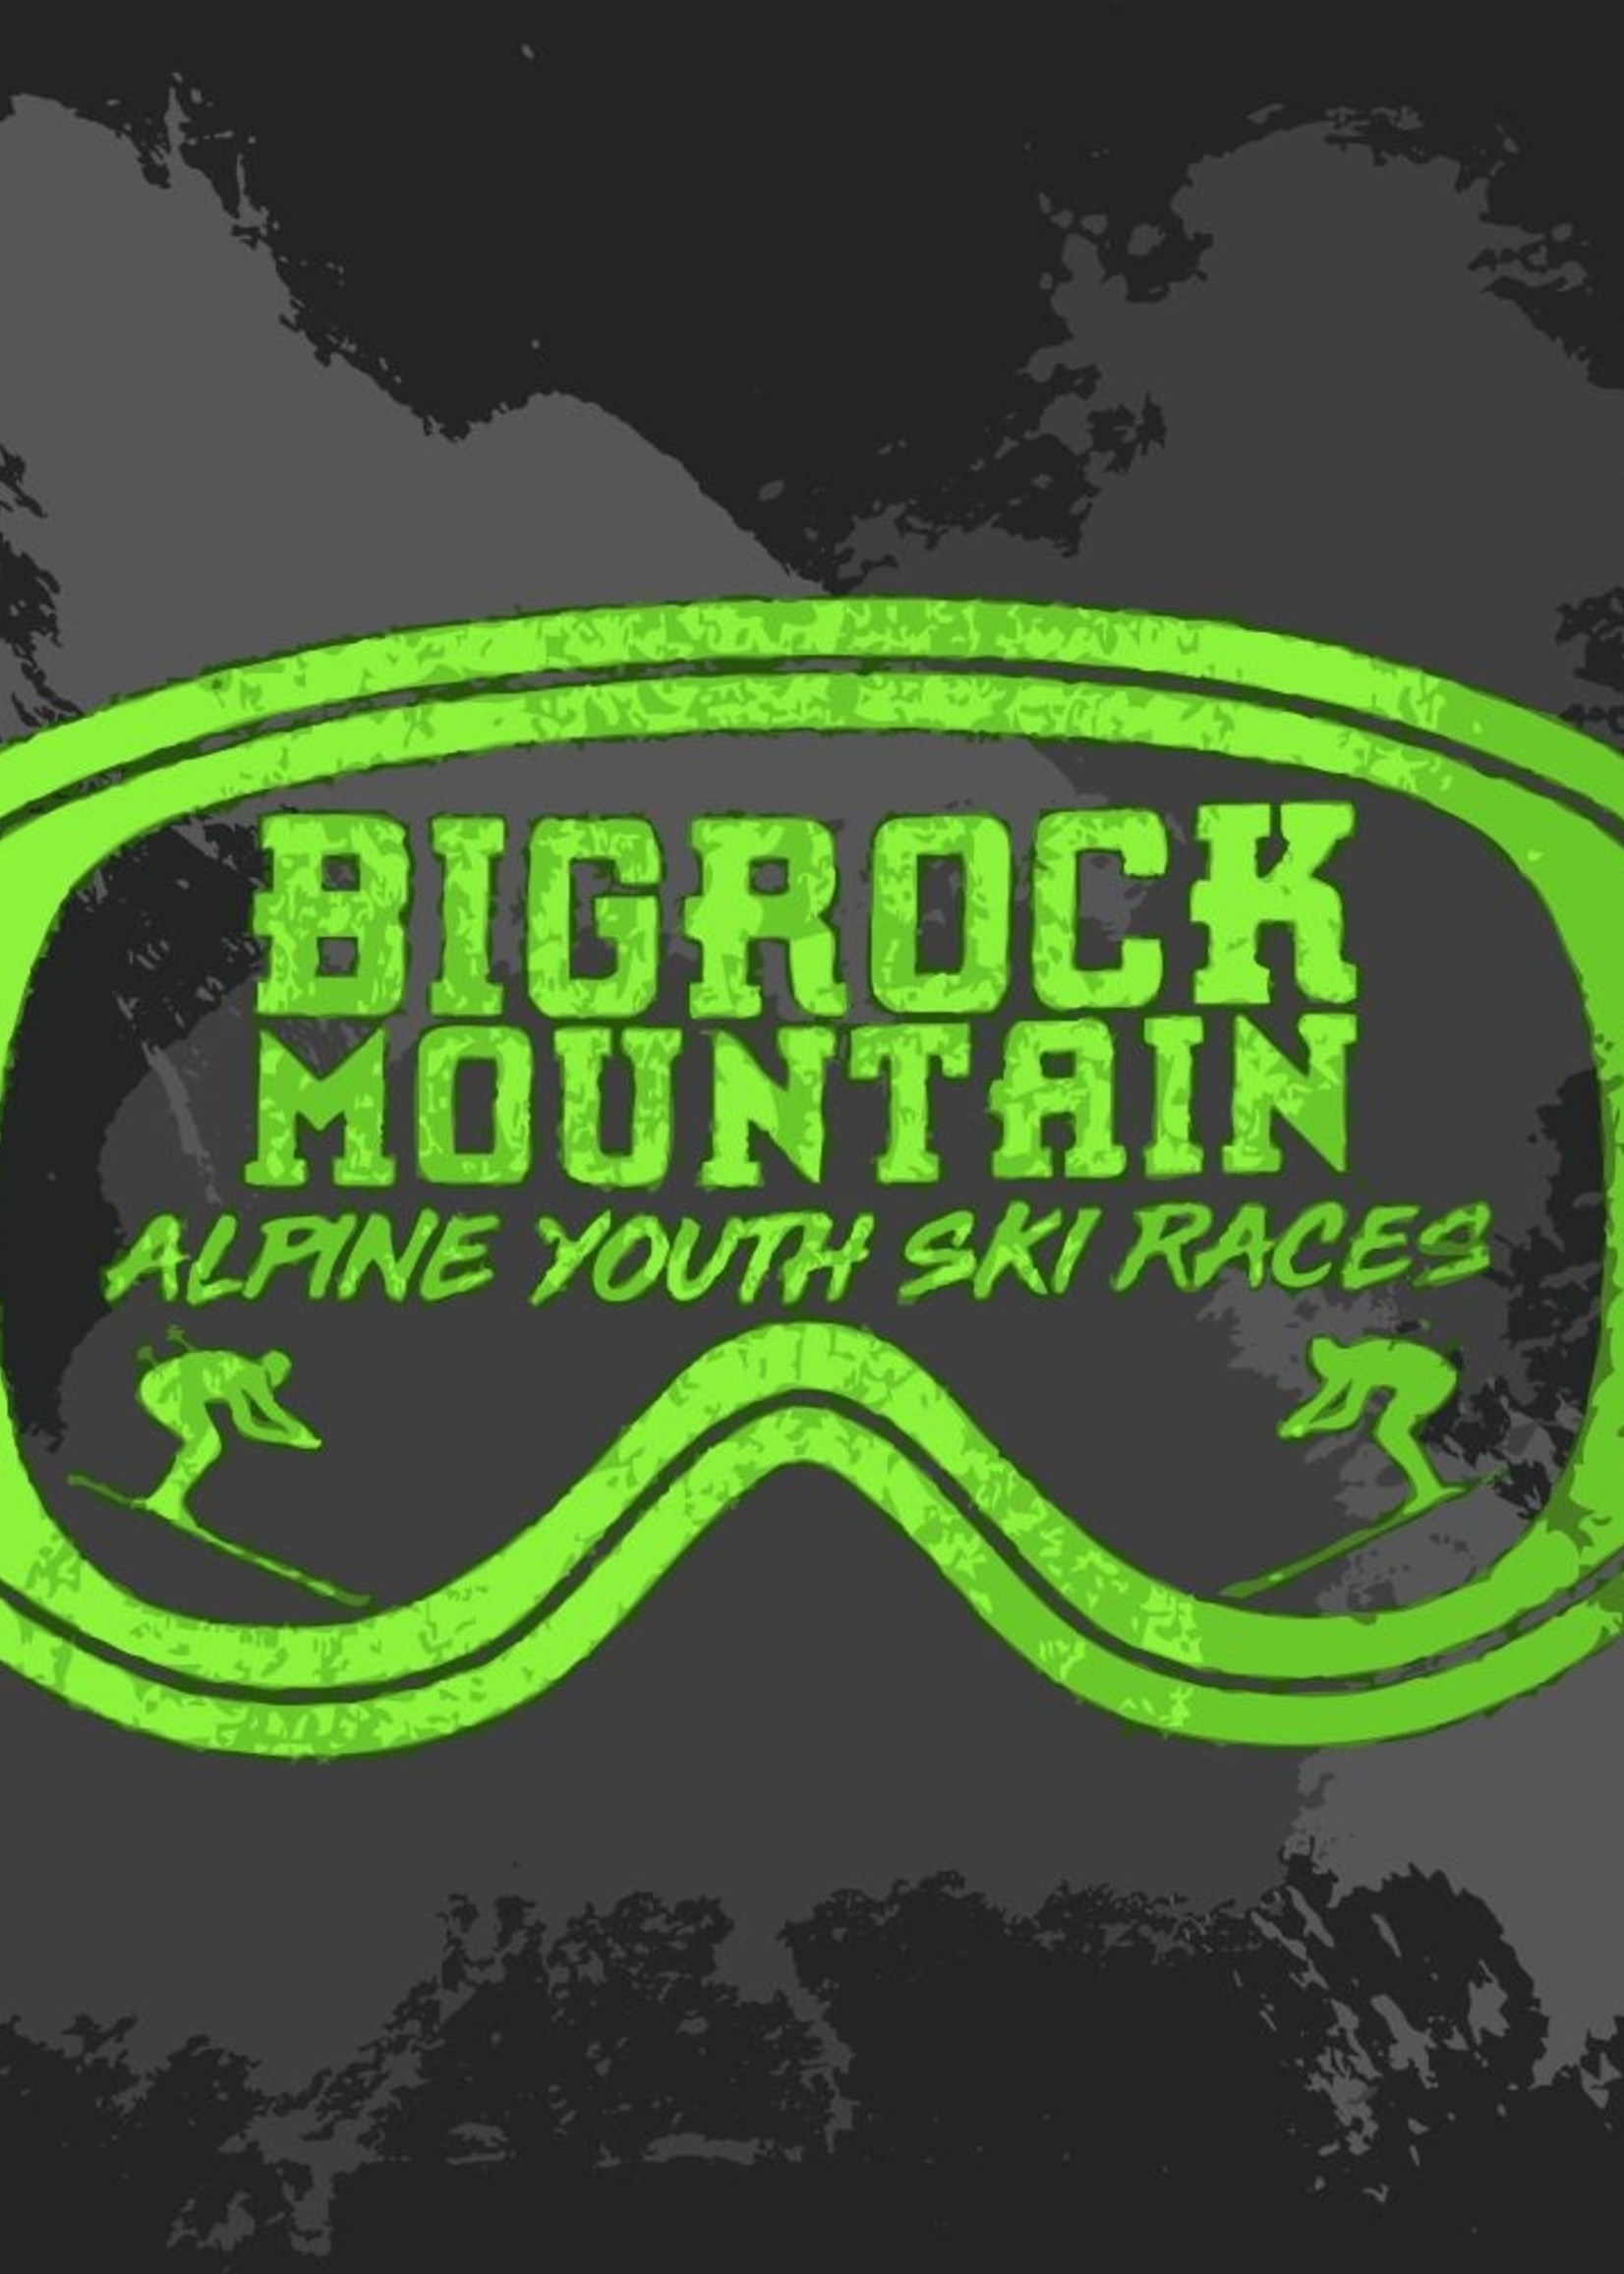 Youth Ski Race Program